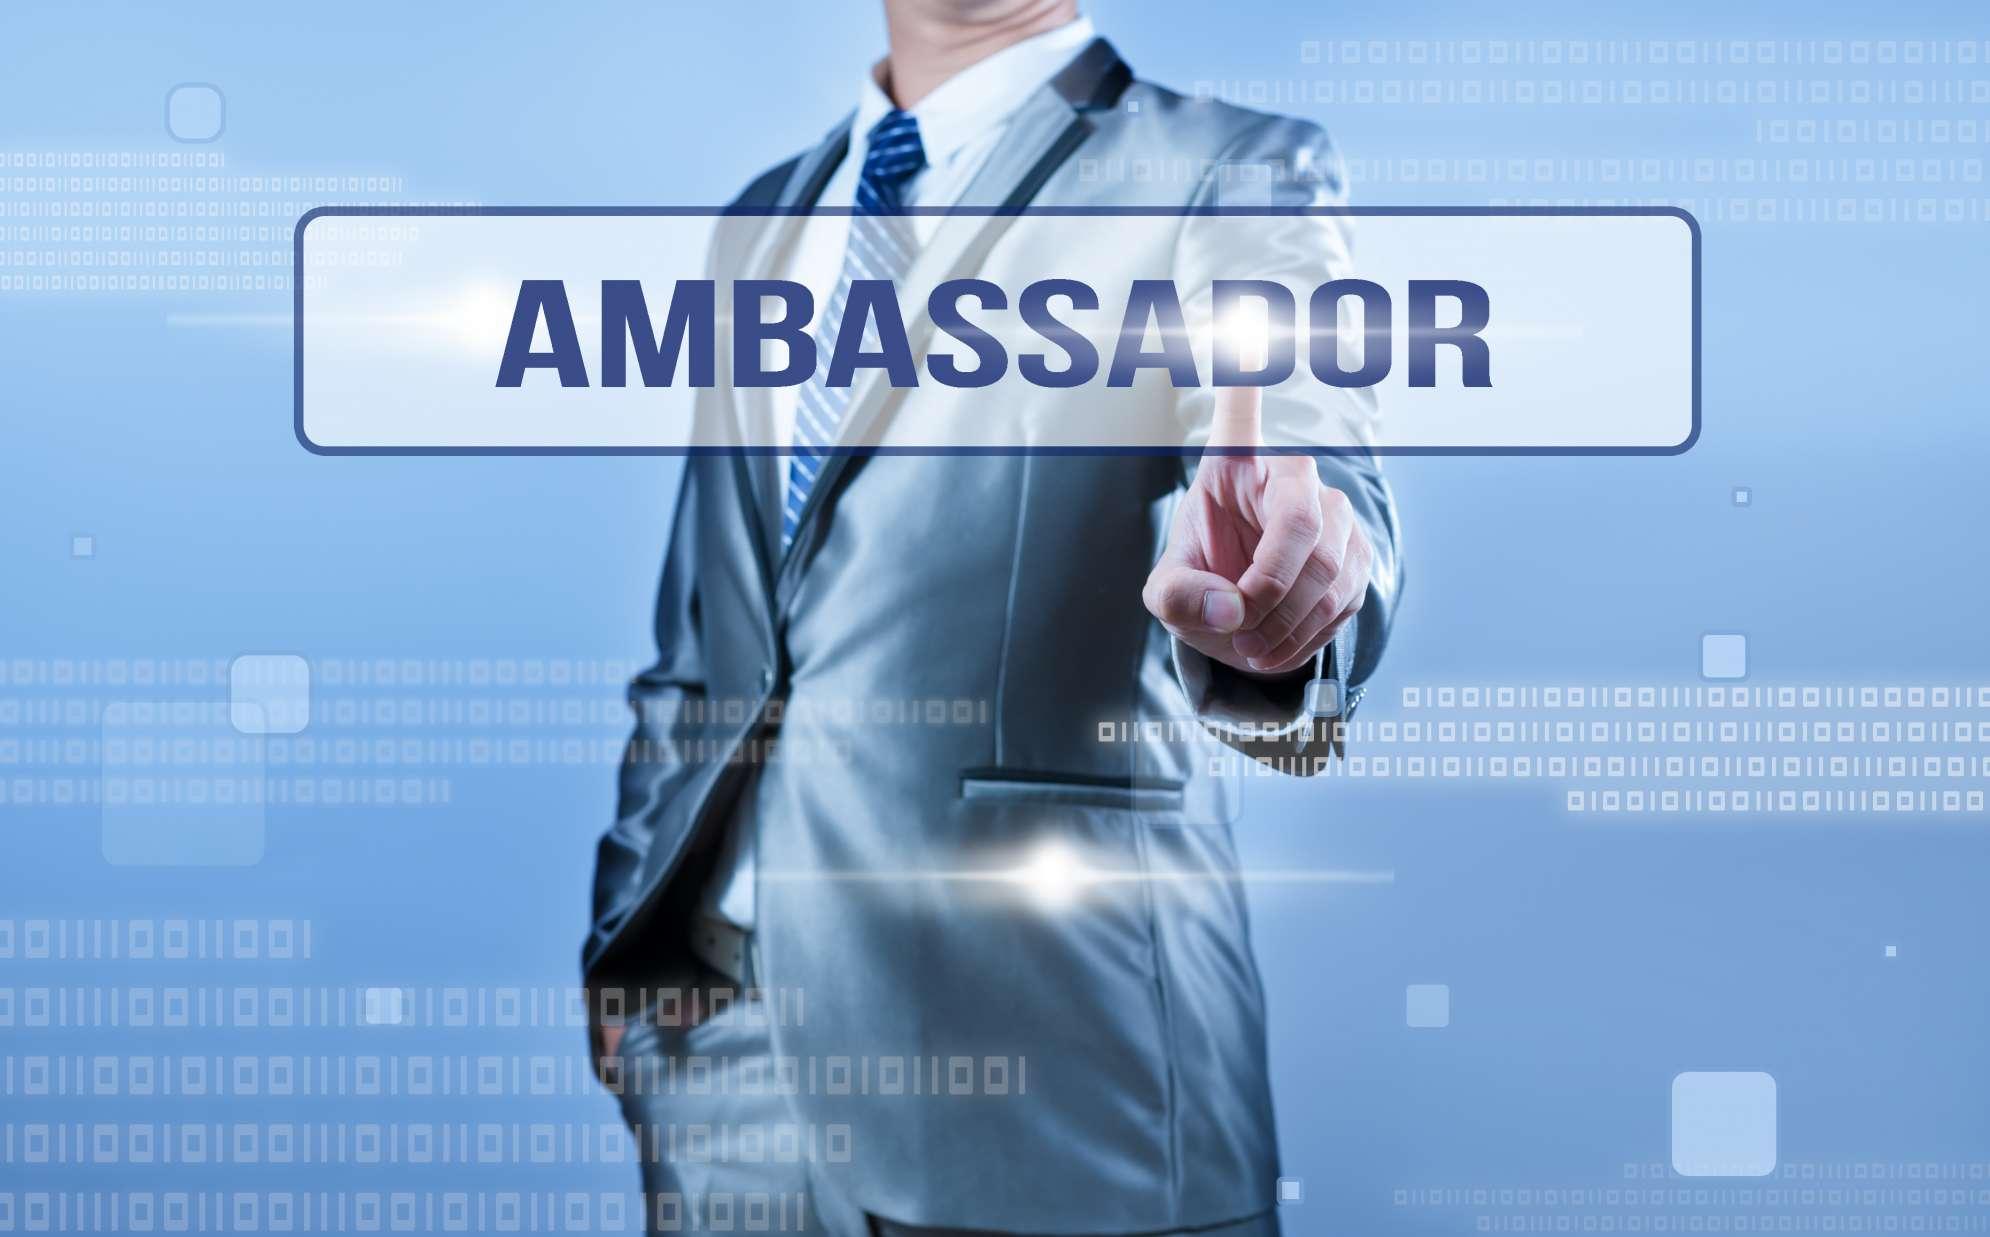 Ambassador: GIF FAM and StayWoke community